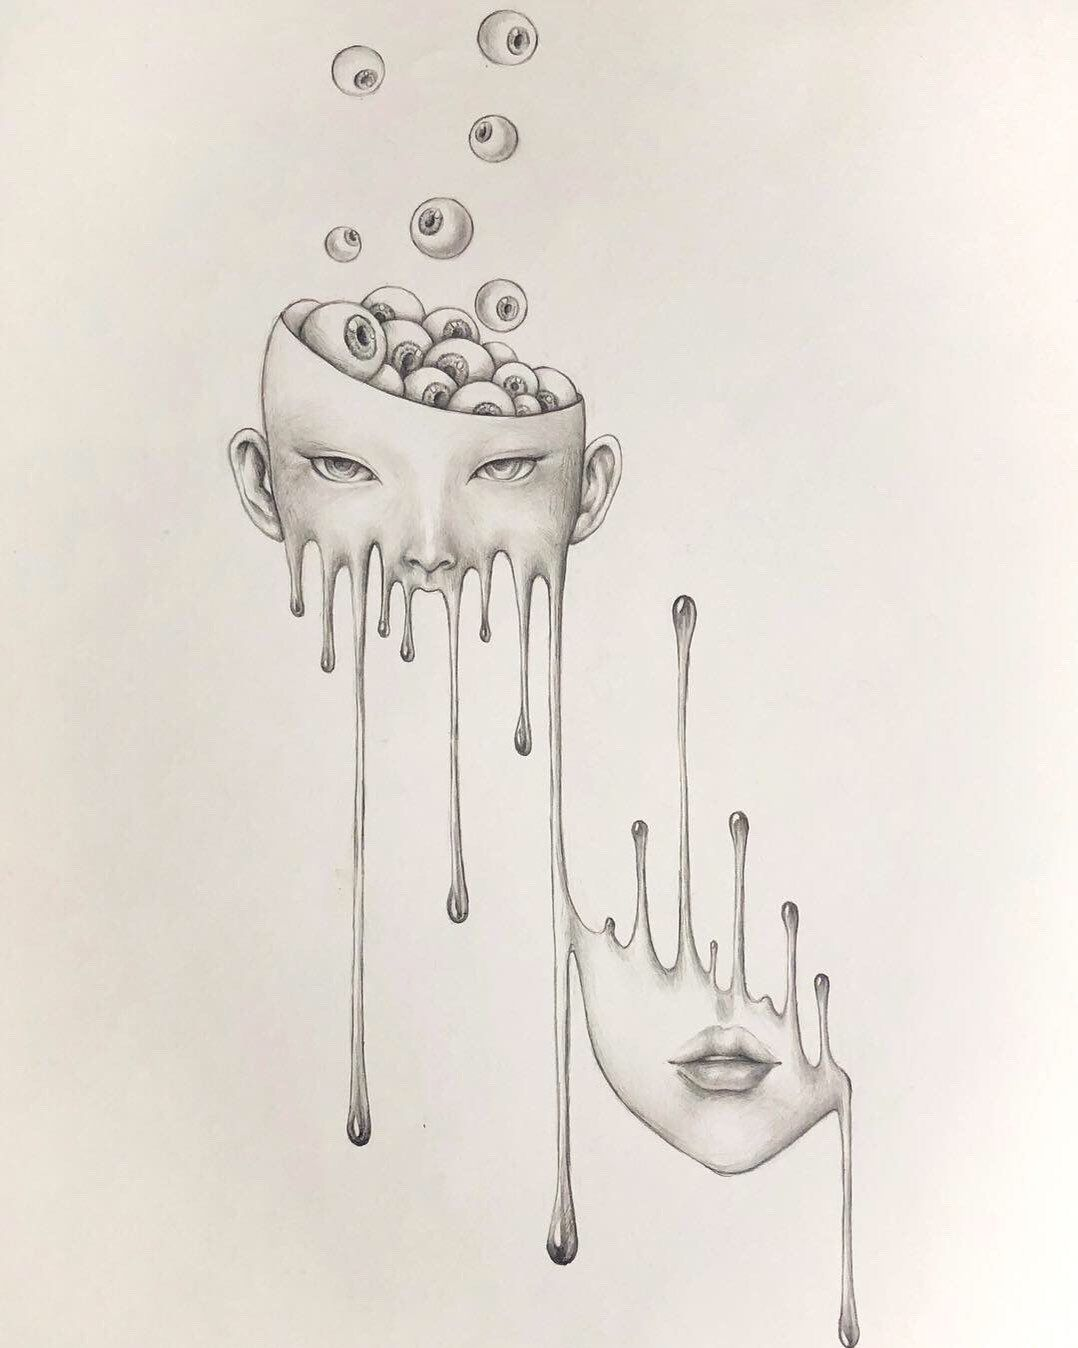 limit autographed print, melting Girl with eyeball, surreal pencil drawing, horror Wall Decor, dark art, popsurrealism dark fantasy pop